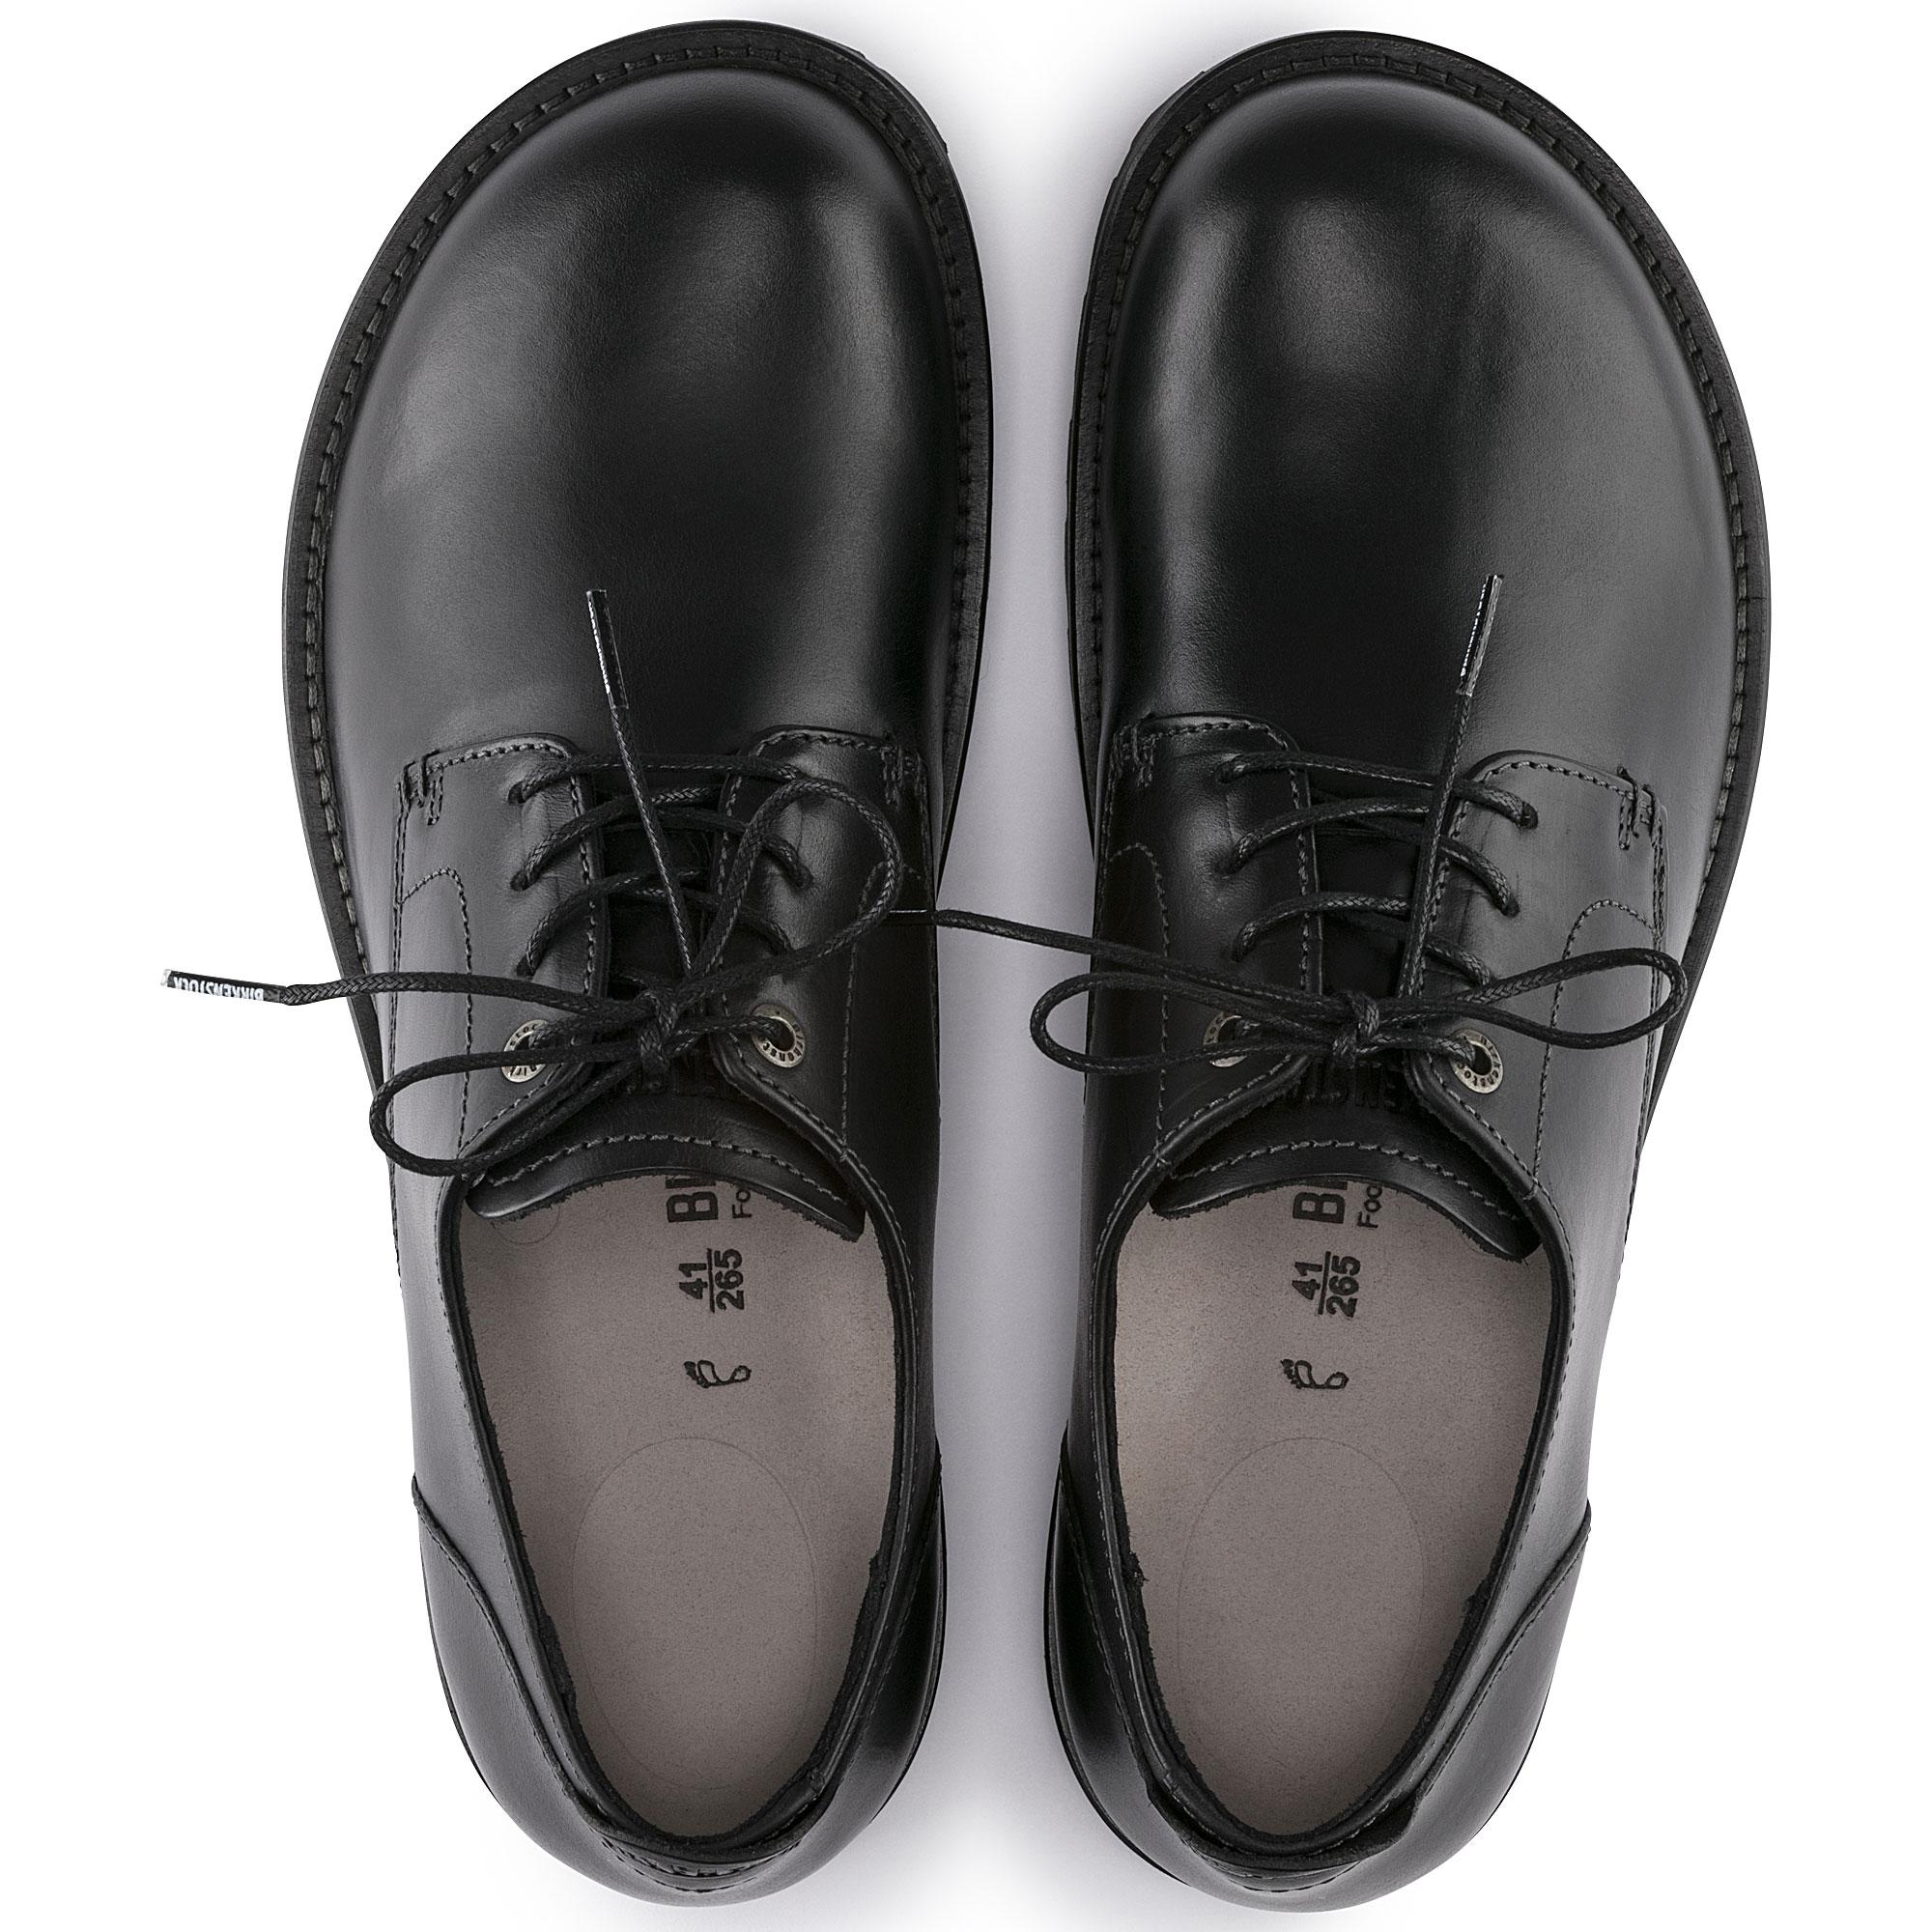 Gilford Natural Leather Black